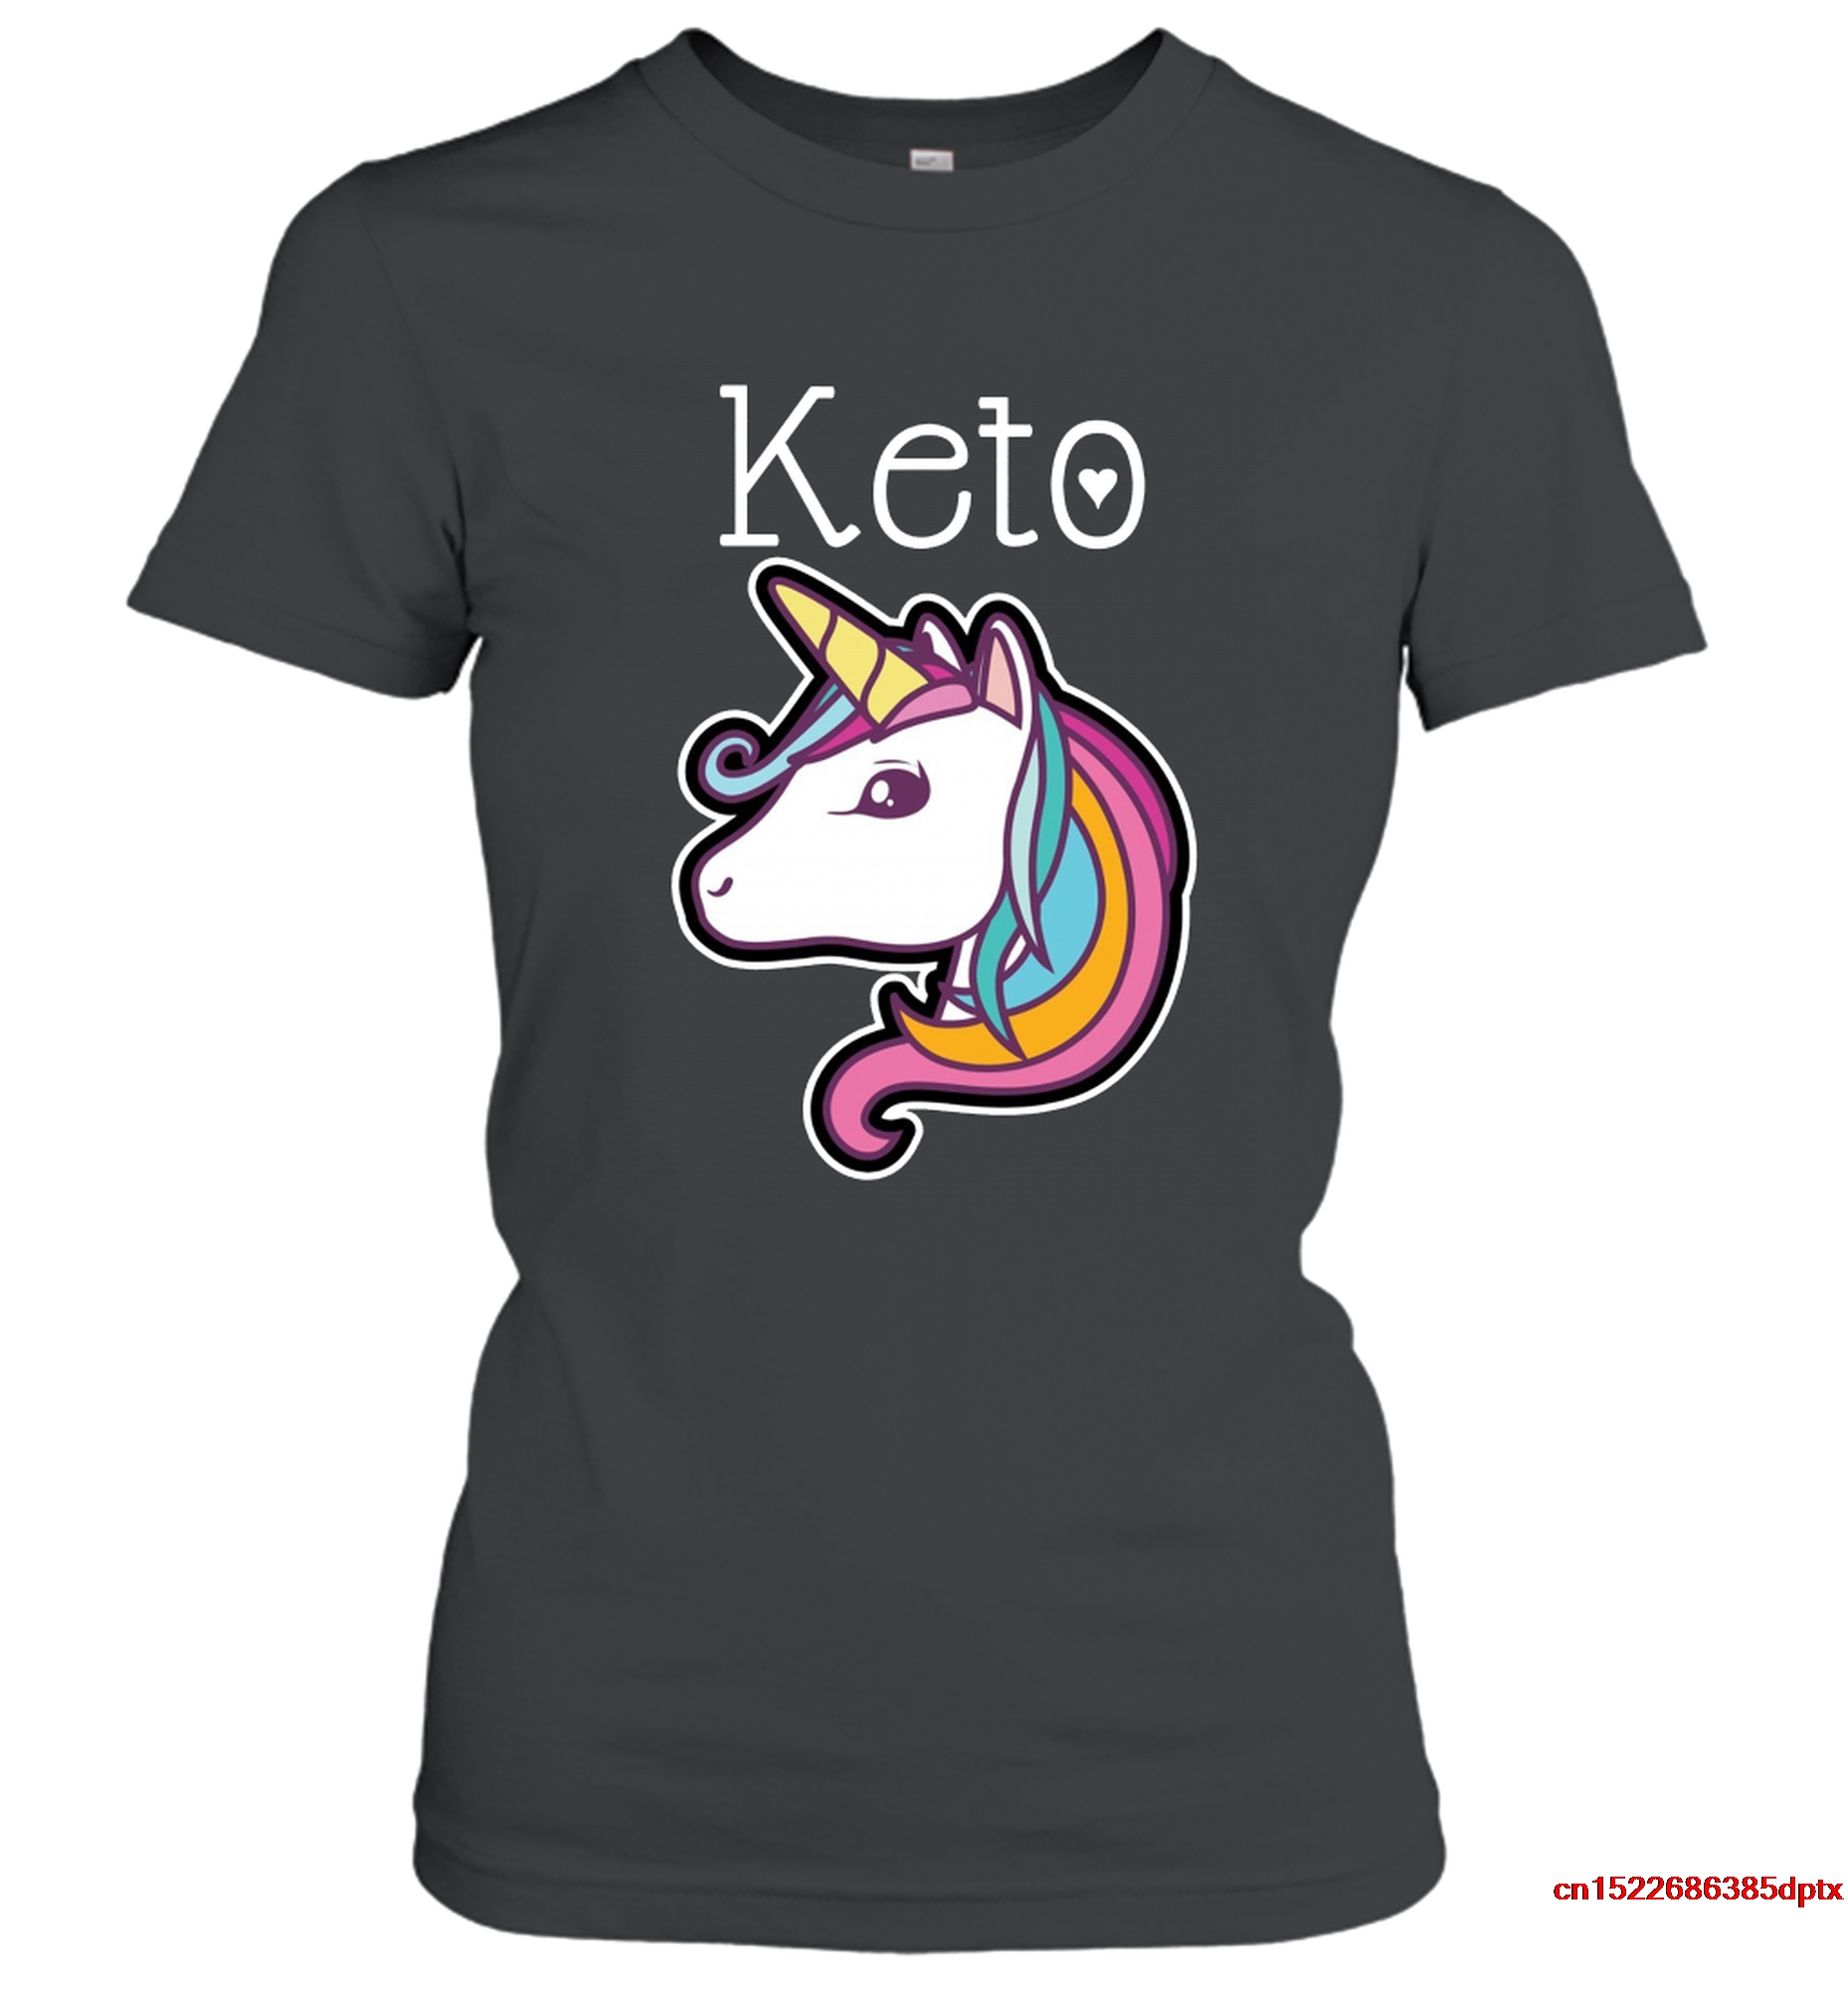 man's t-shirt Keto Unicorns Are Real T Shirt T-shirt 2855 women shirt